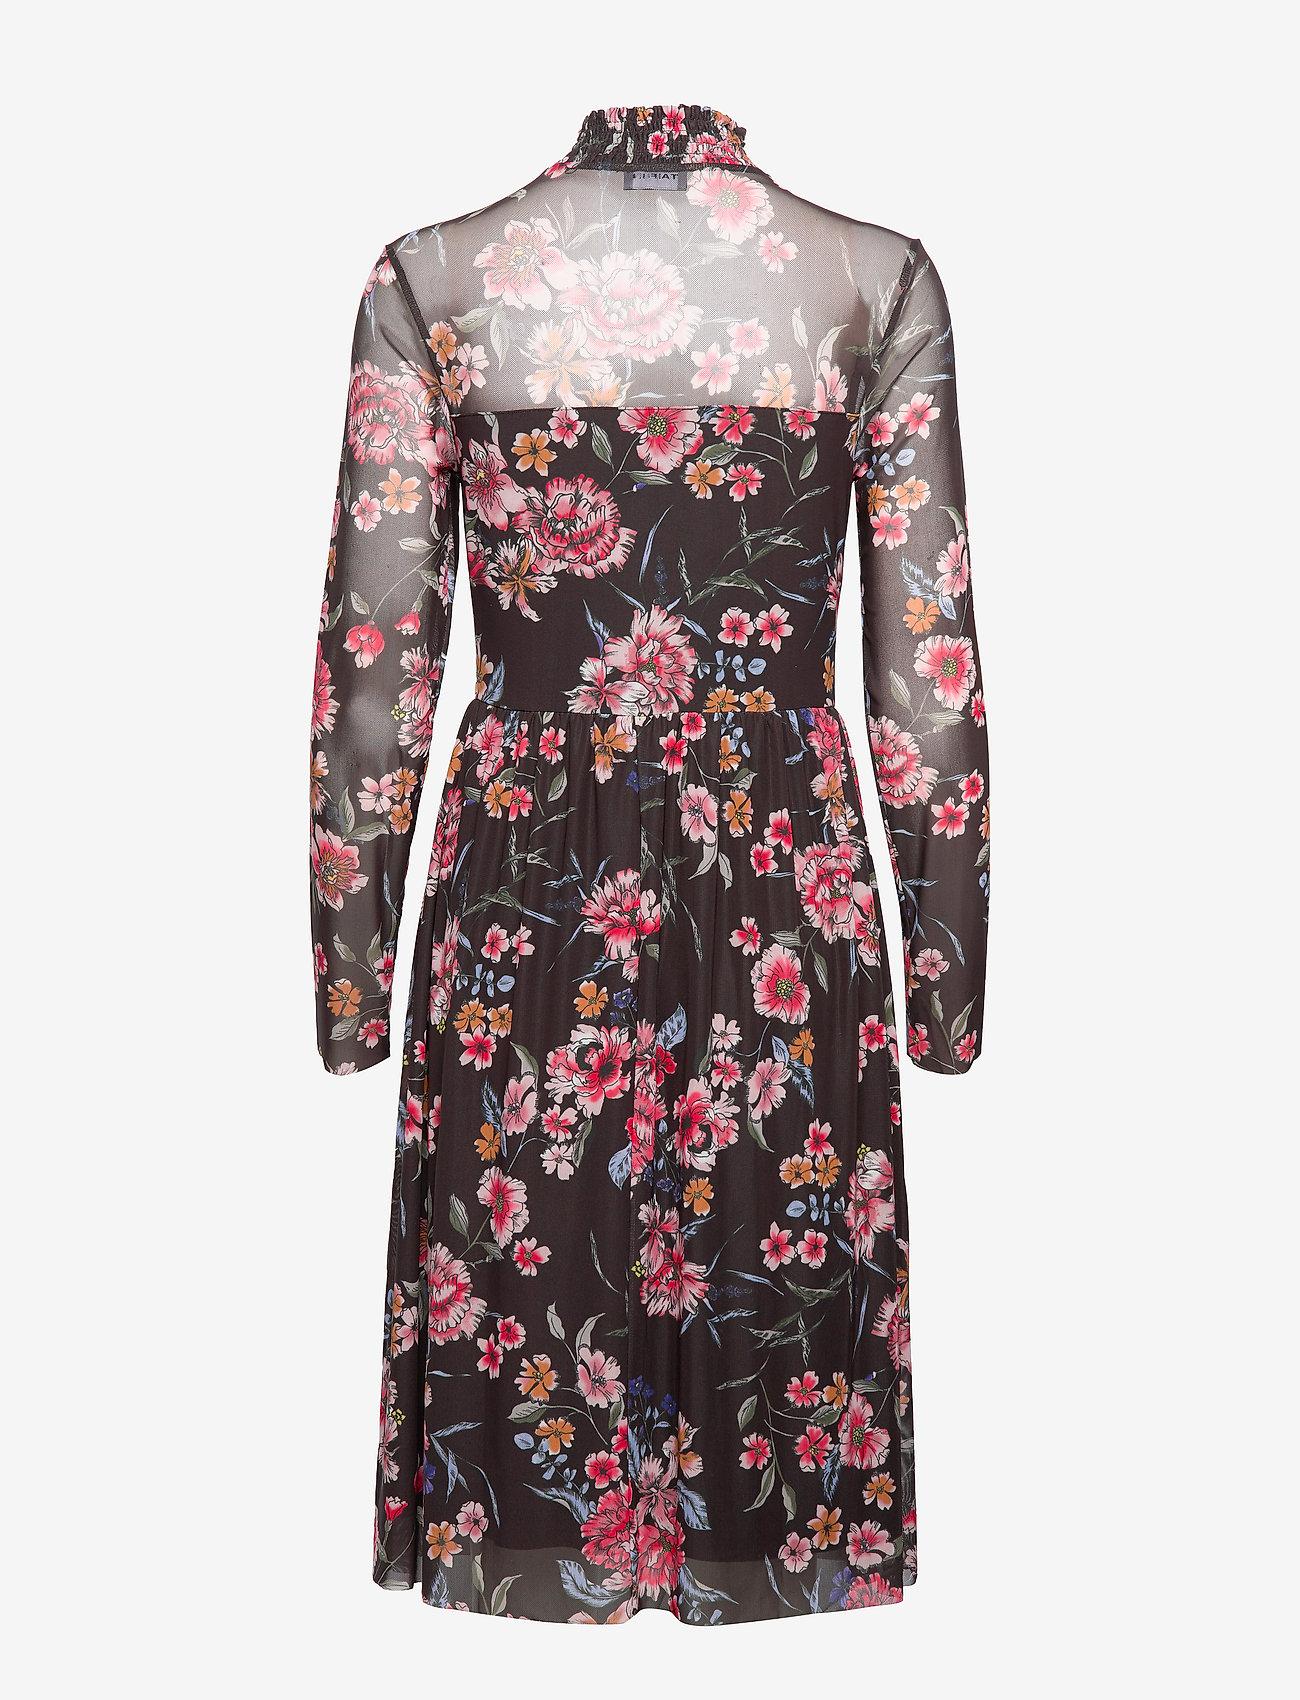 Taifun - DRESS KNITTED FABRIC - midiklänningar - black patterned - 1